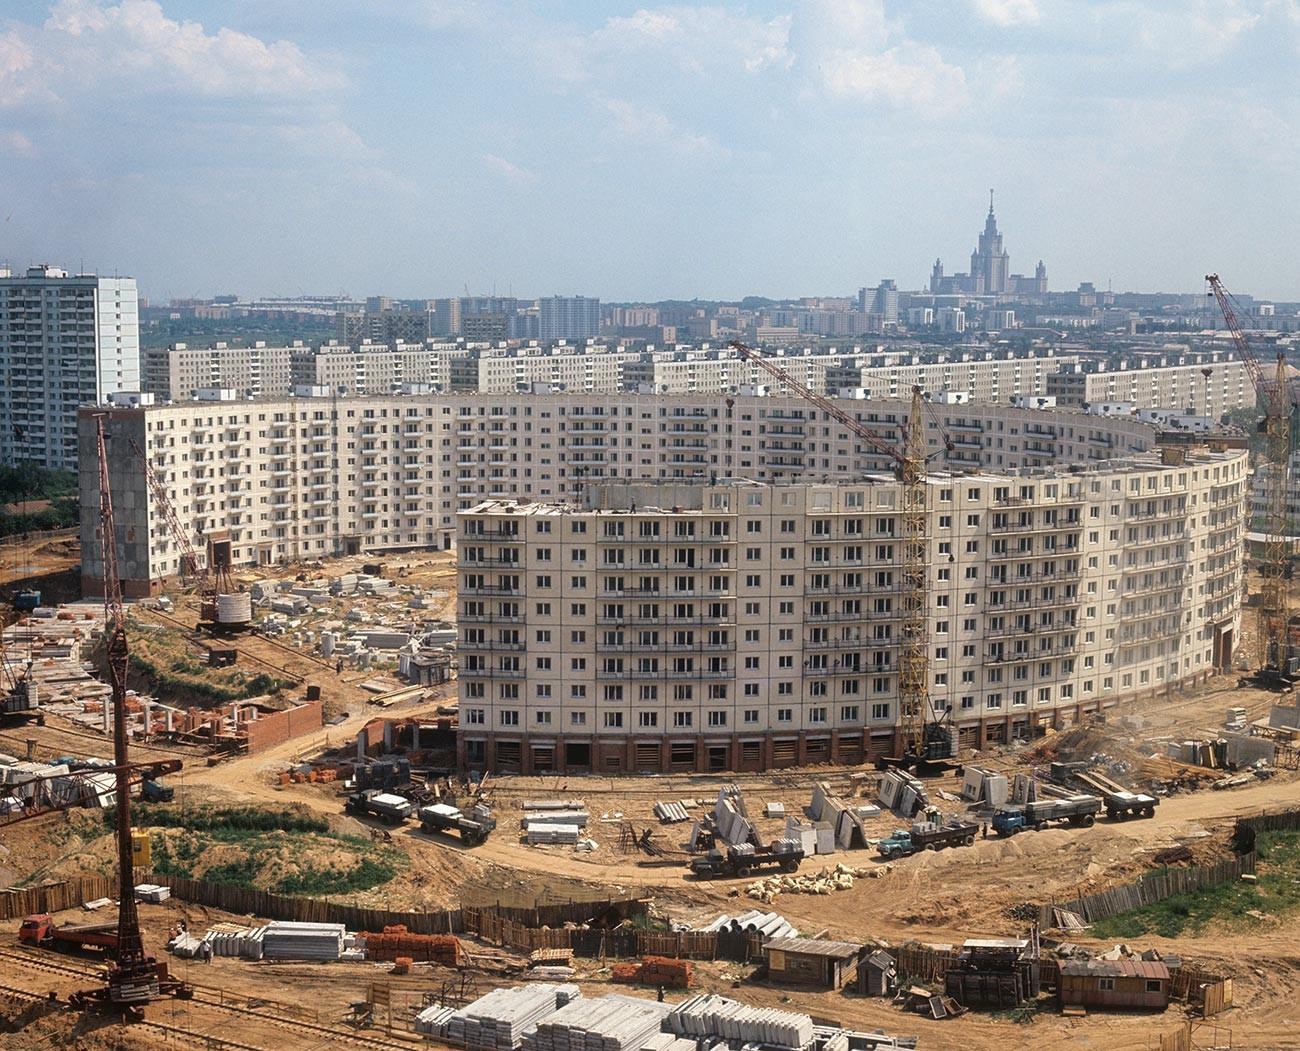 Pembangunan hunian bersusun berbentuk lingkaran di Jalan Nezhinskaya, Moskow.